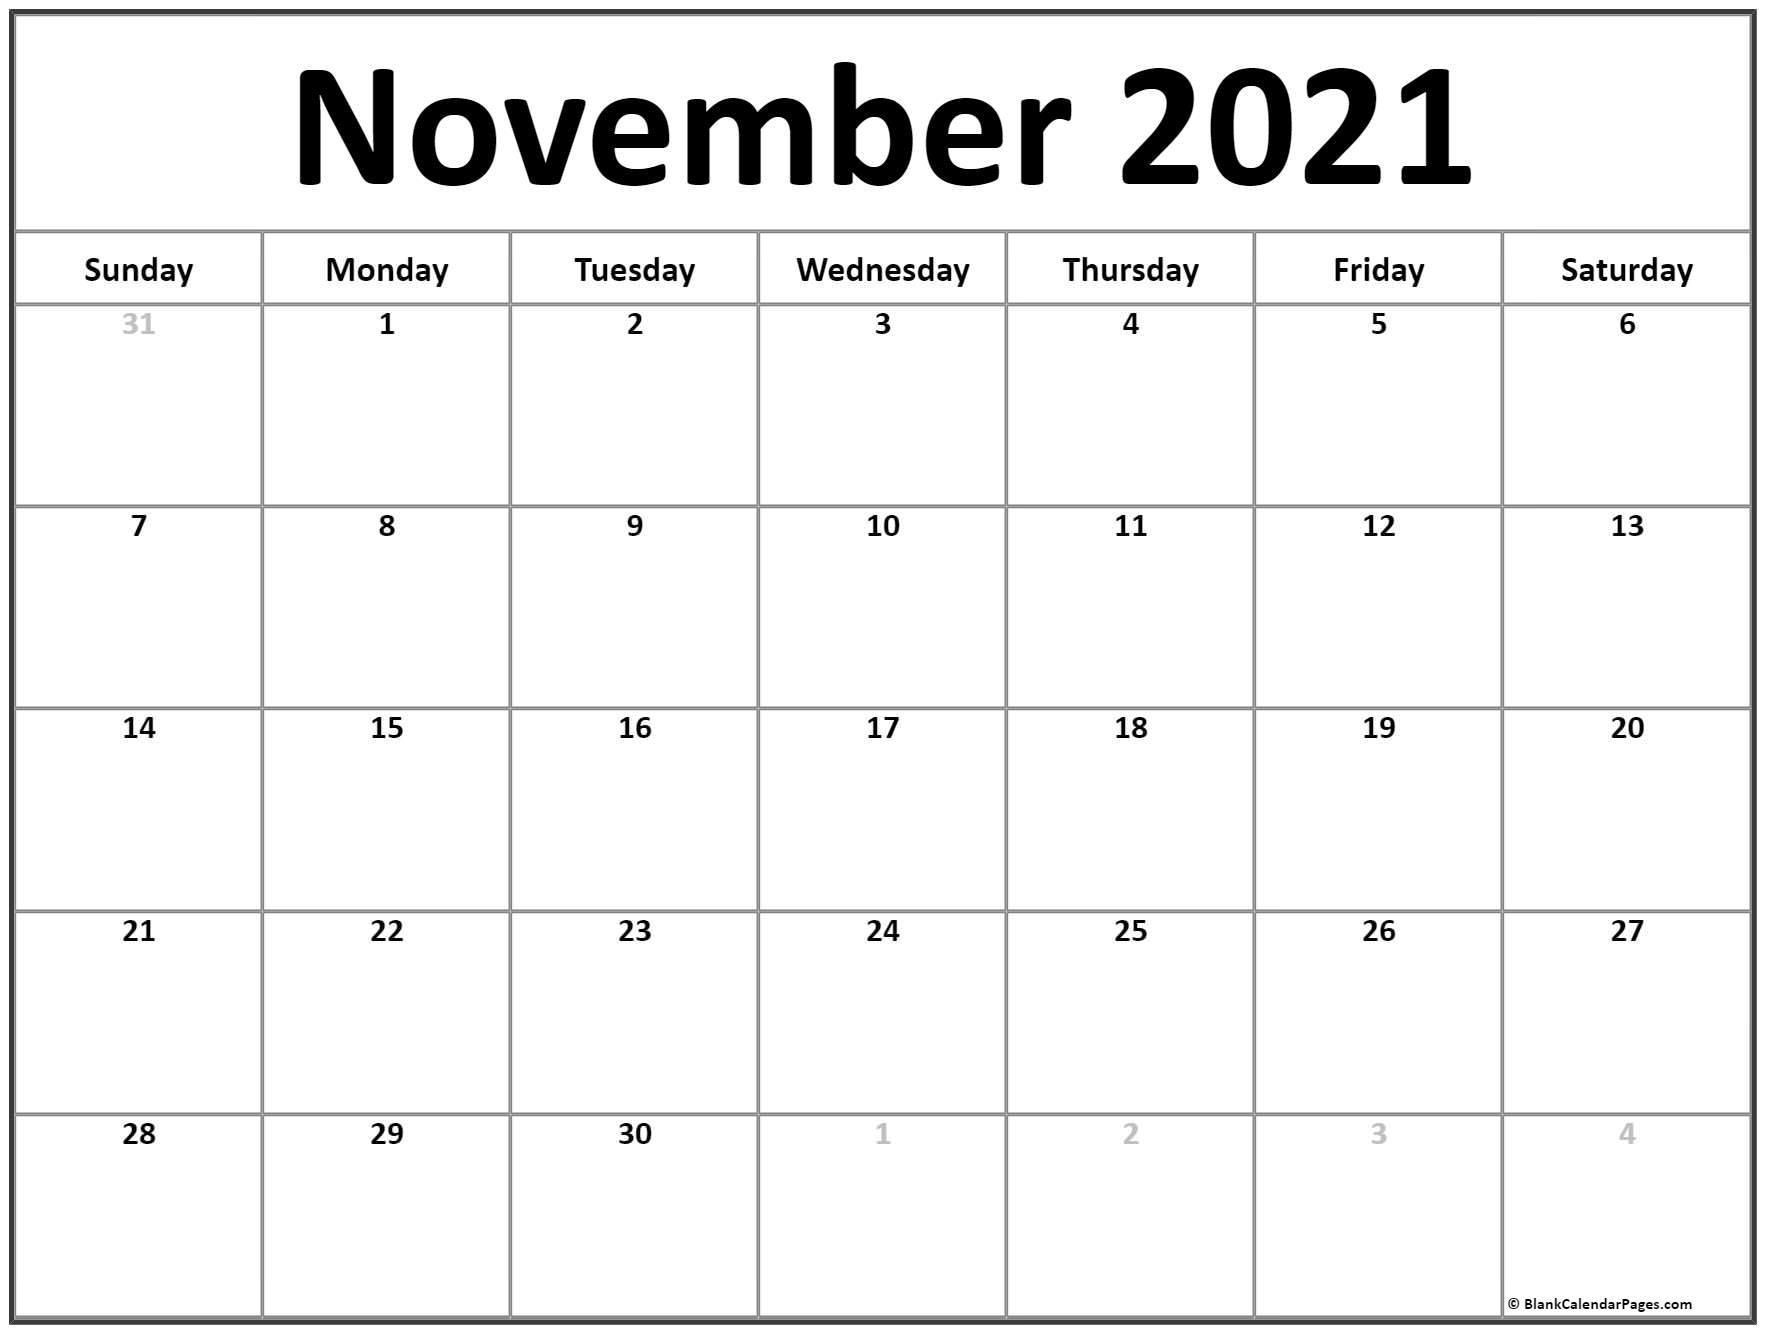 November 2021 Calendar   Free Printable Monthly Calendars Intended For Calendar With November 2021 Mexican Names